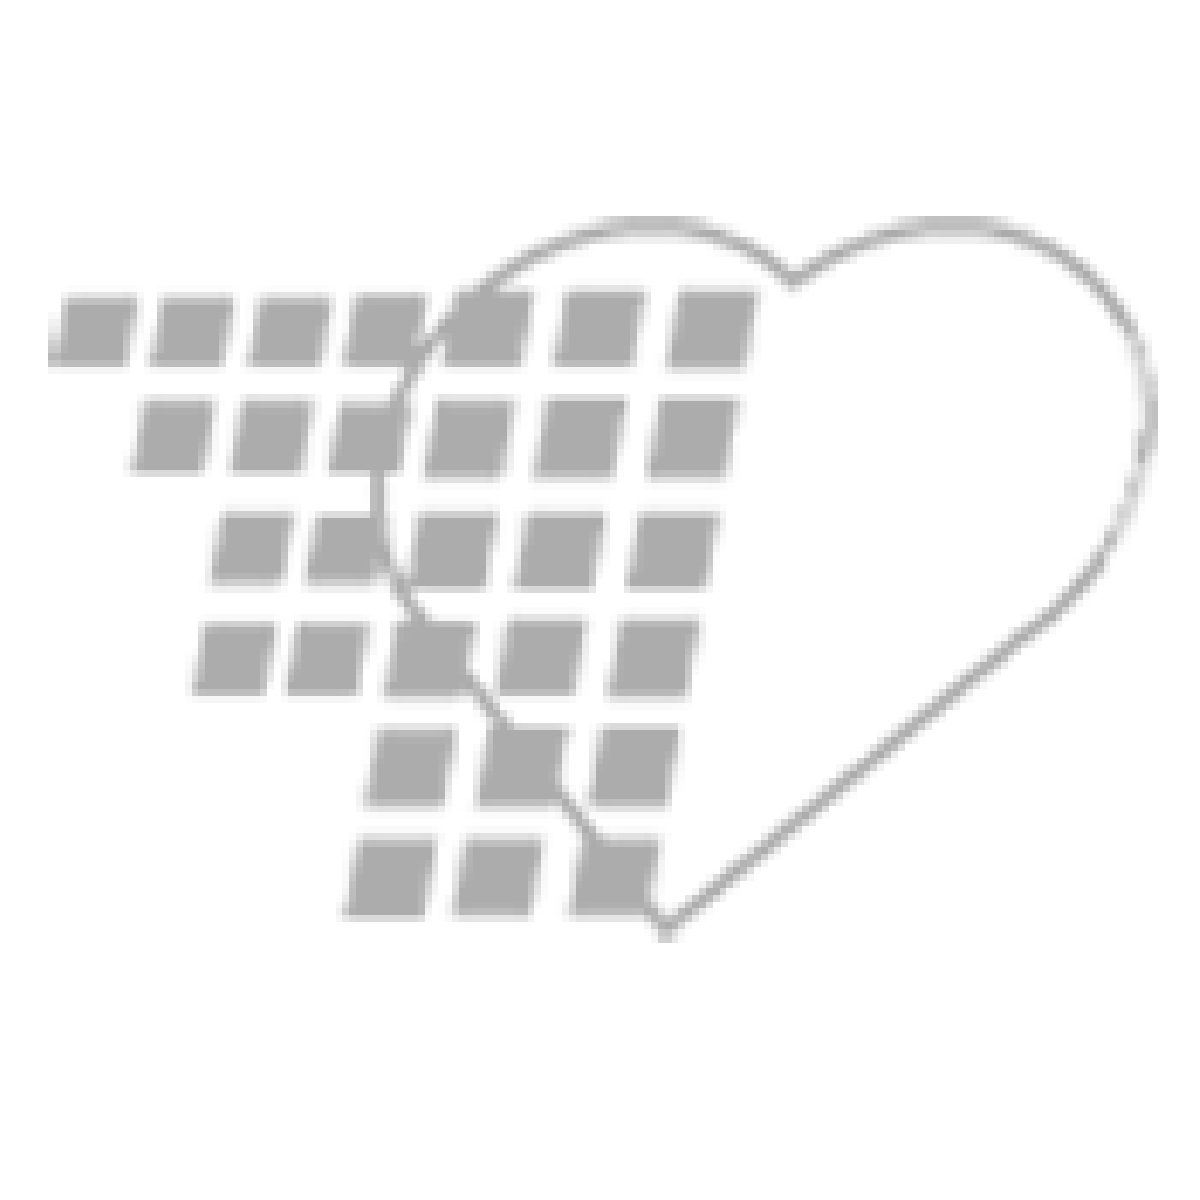 11-81-0098 - Nasco Life/form® Advanced Breast Exam Simulator